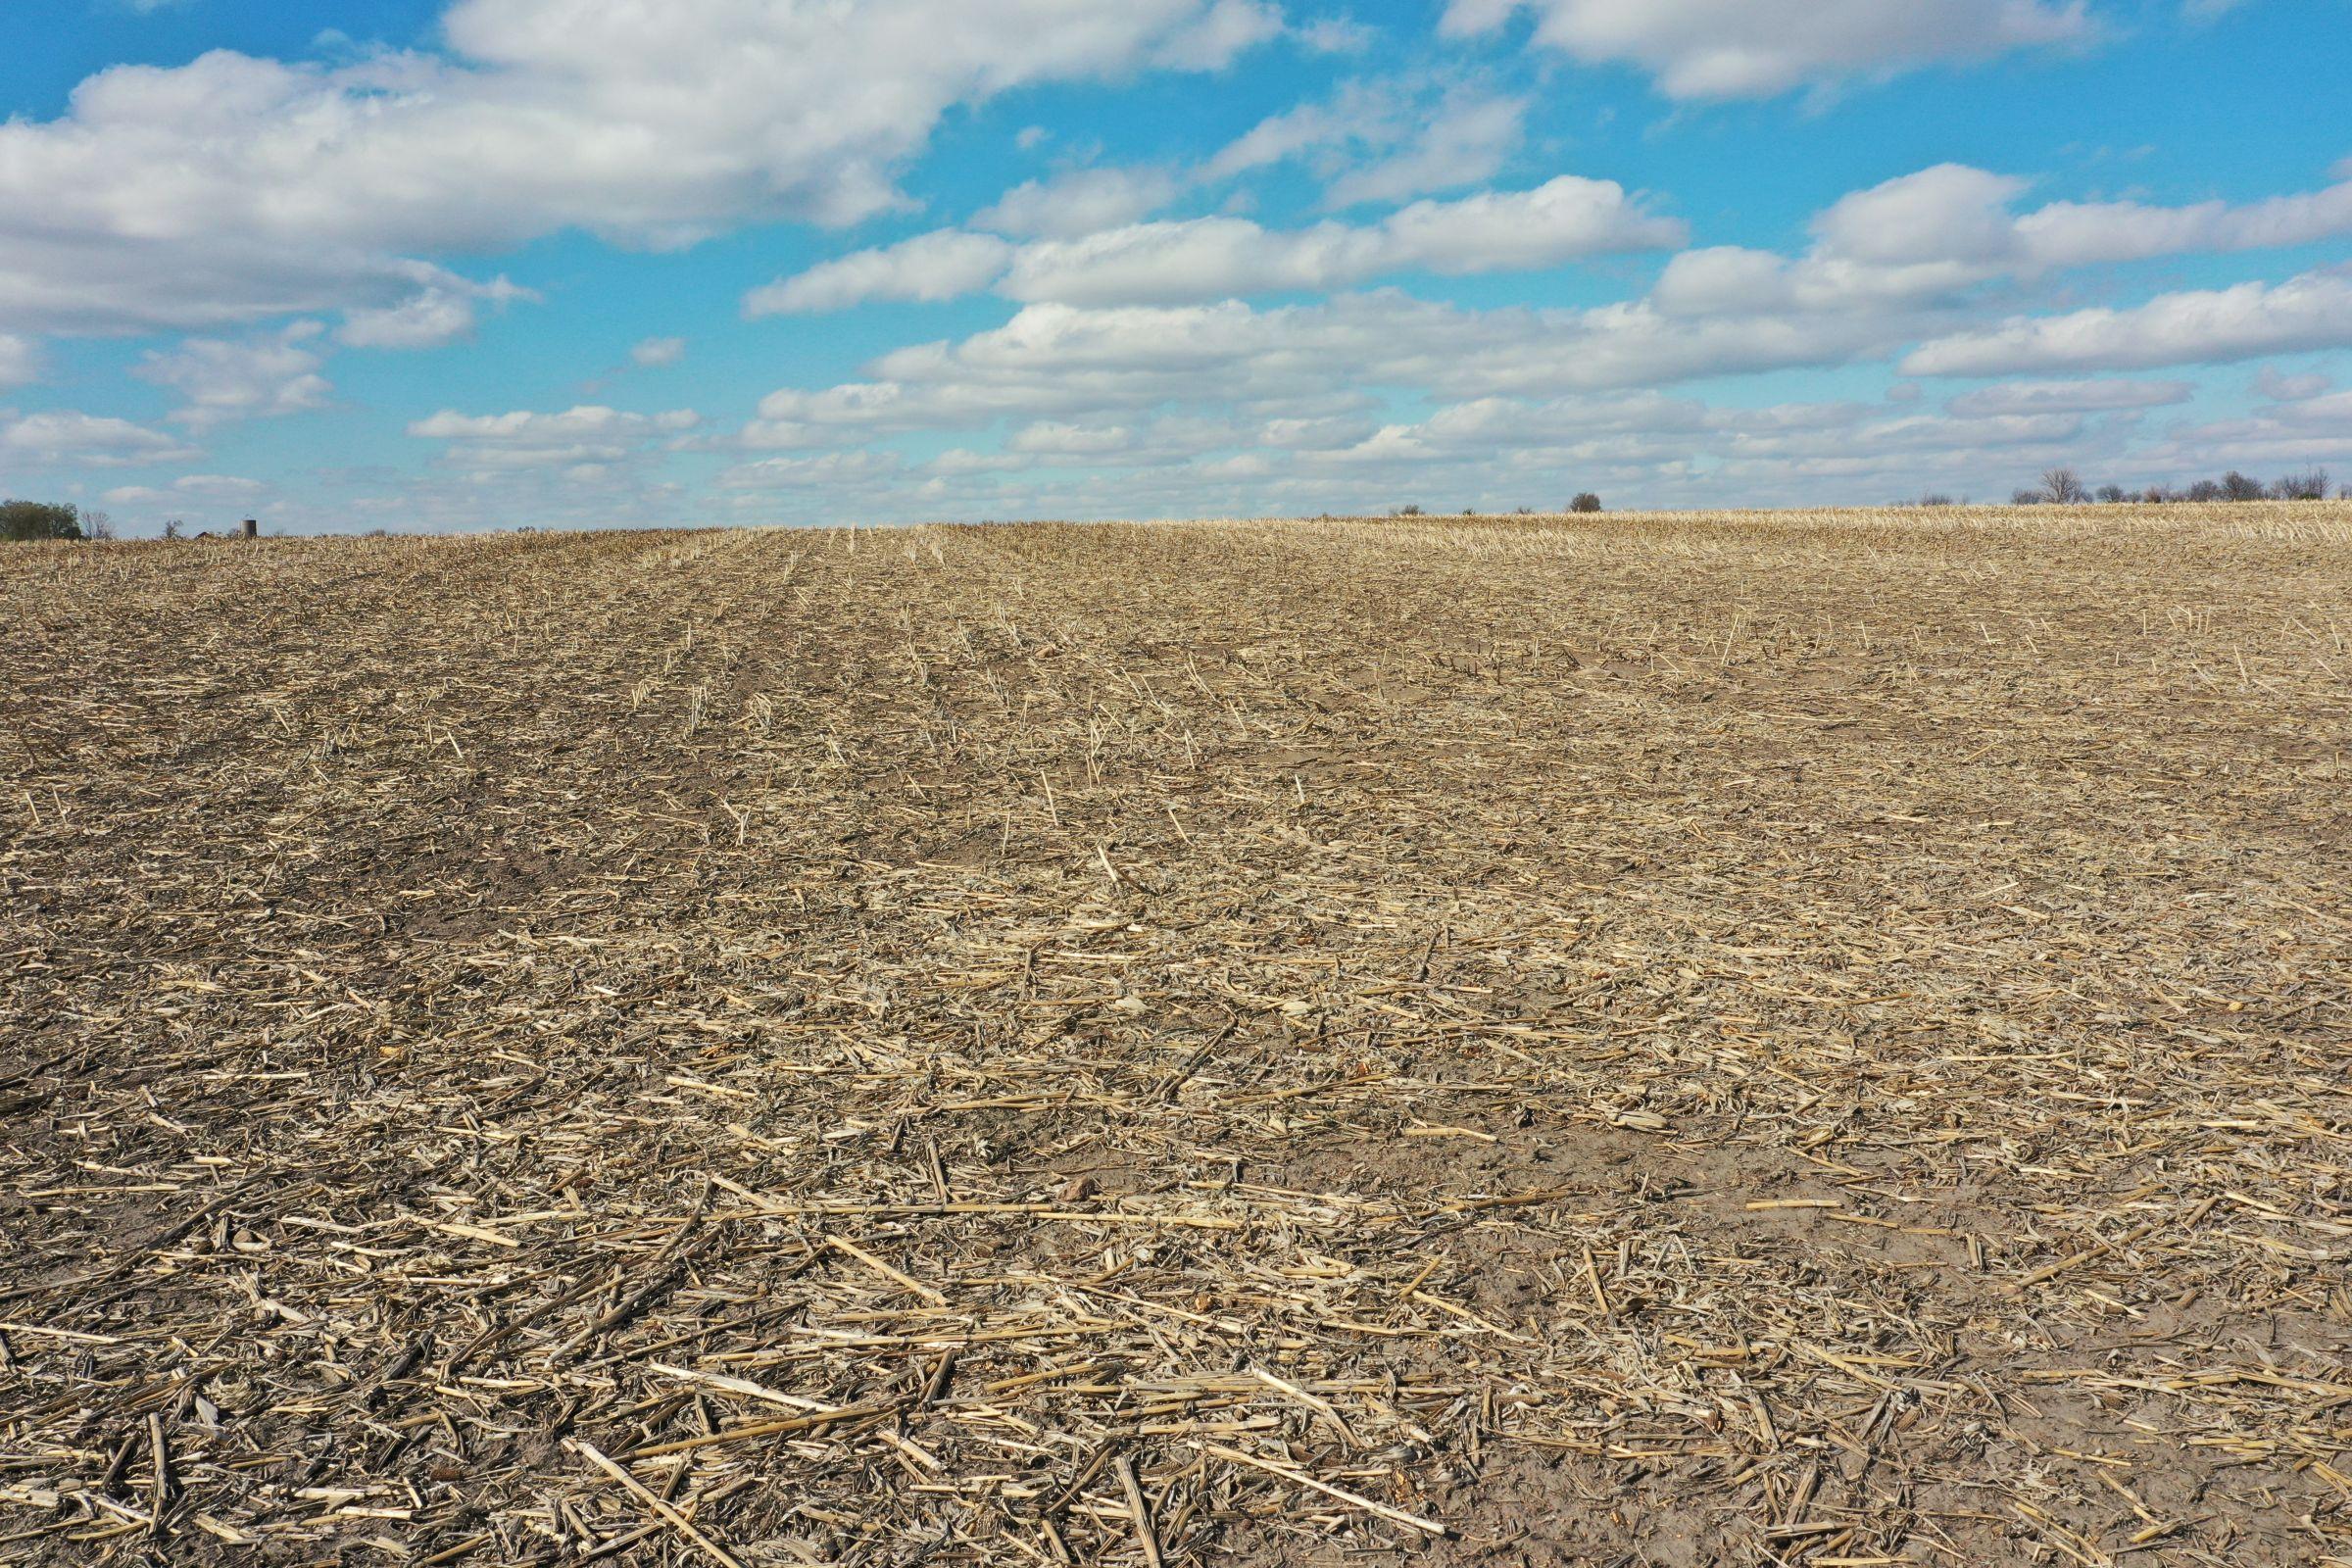 floyd-county-iowa-80-acres-listing-number-15485-3-2021-04-25-212714.JPG